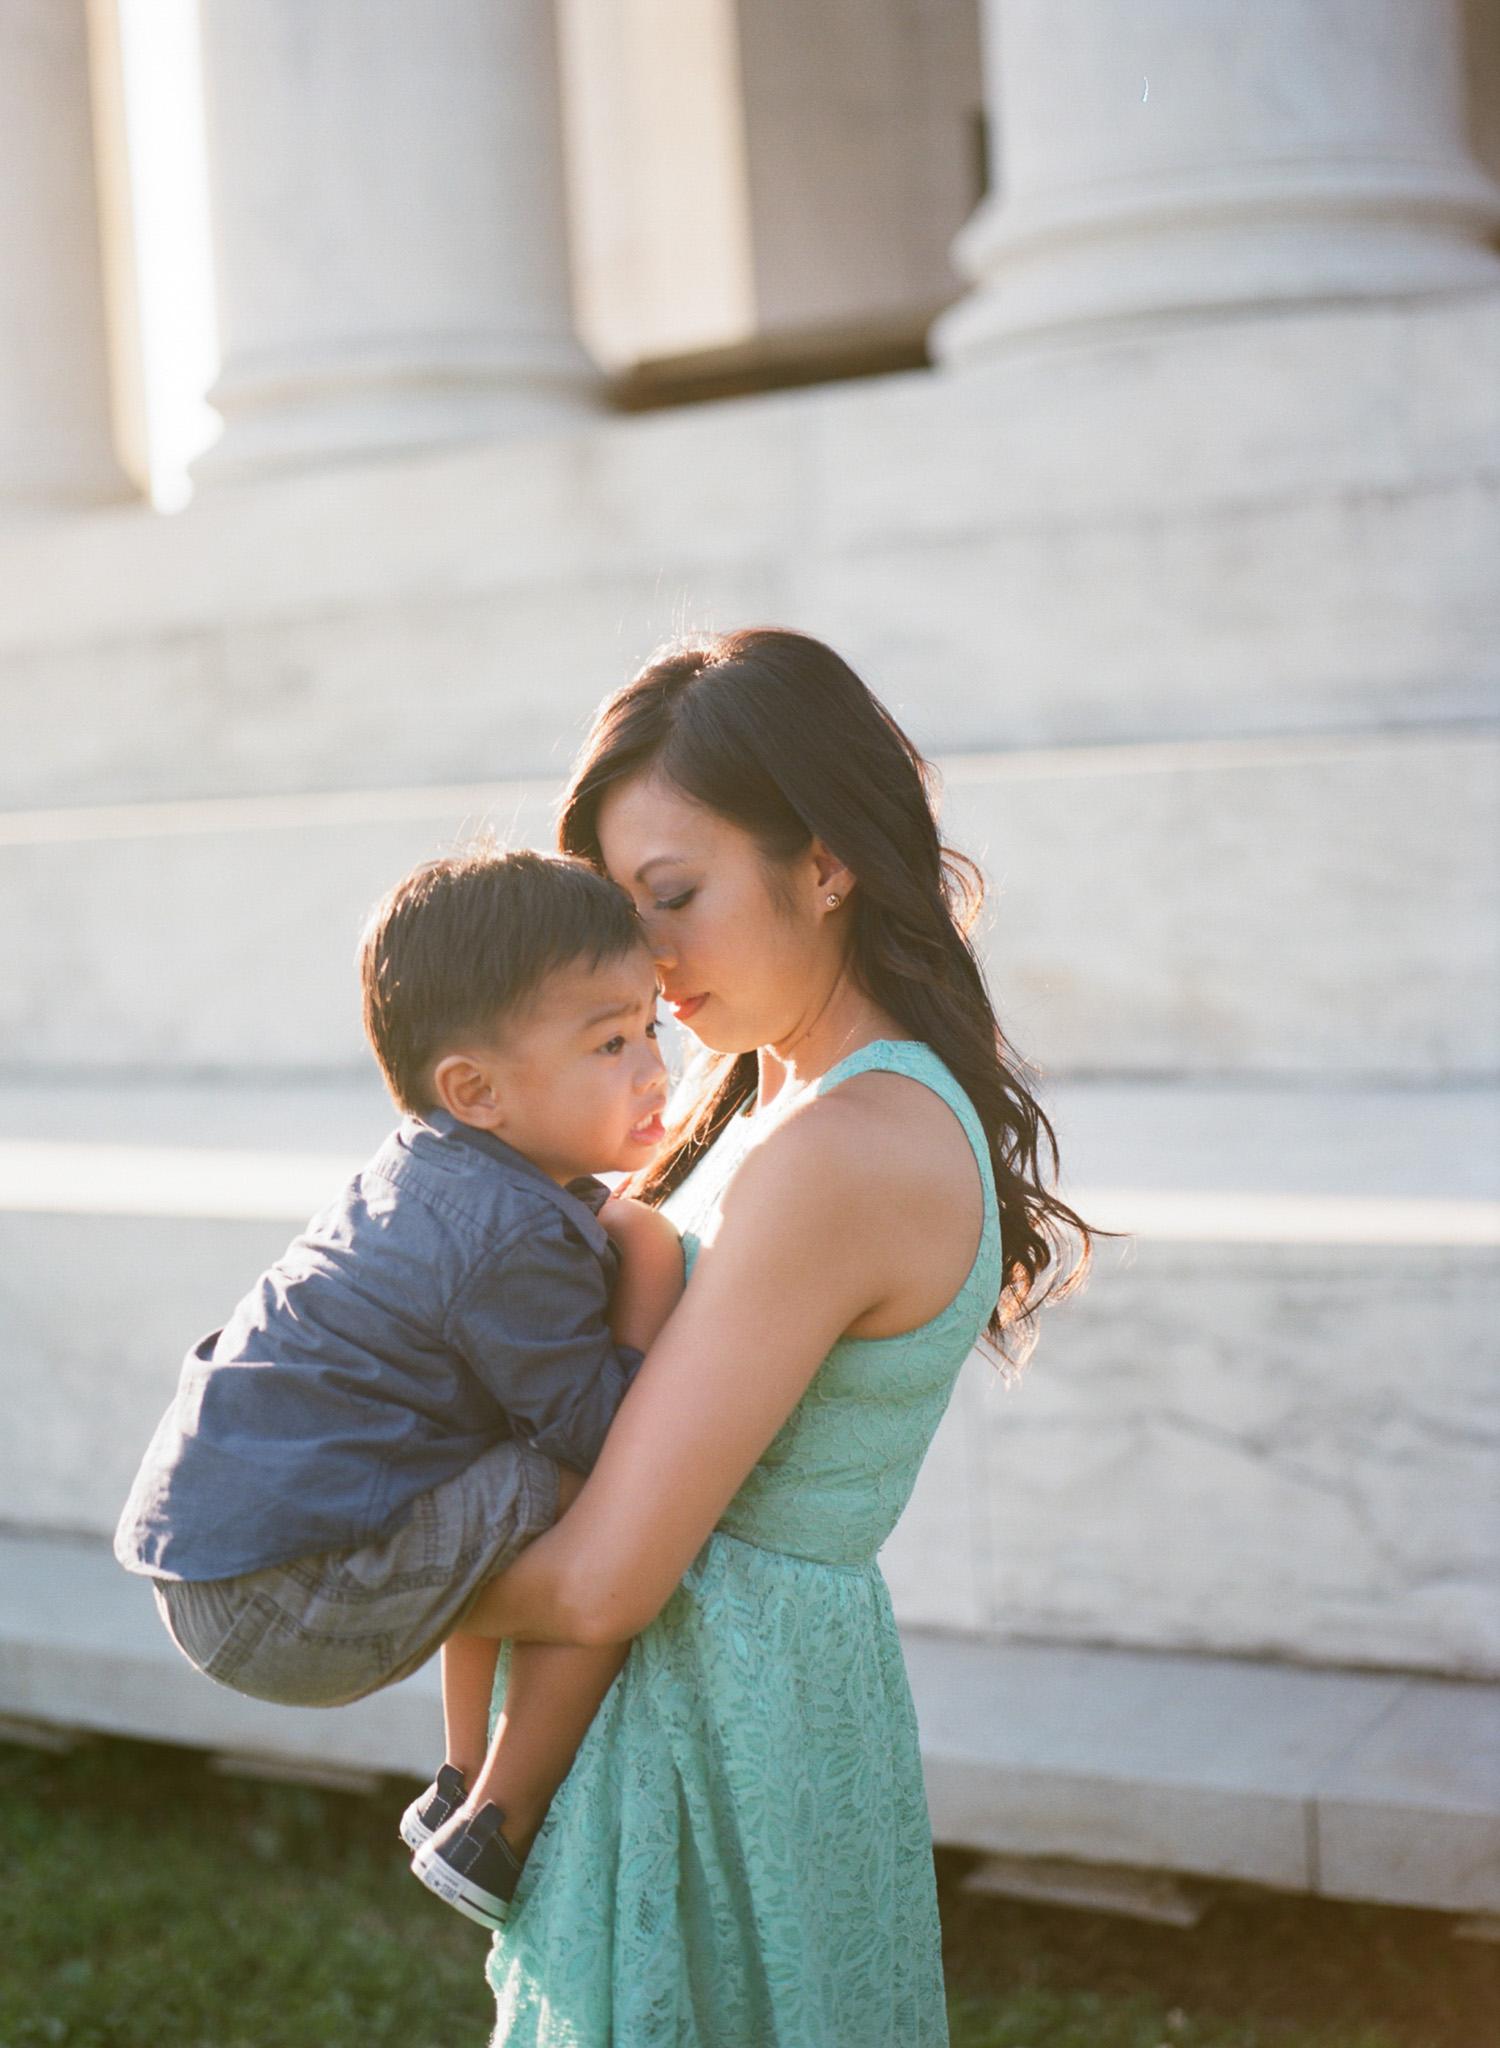 Jefferson-Memorial-Portrait-Photographer-11.jpg